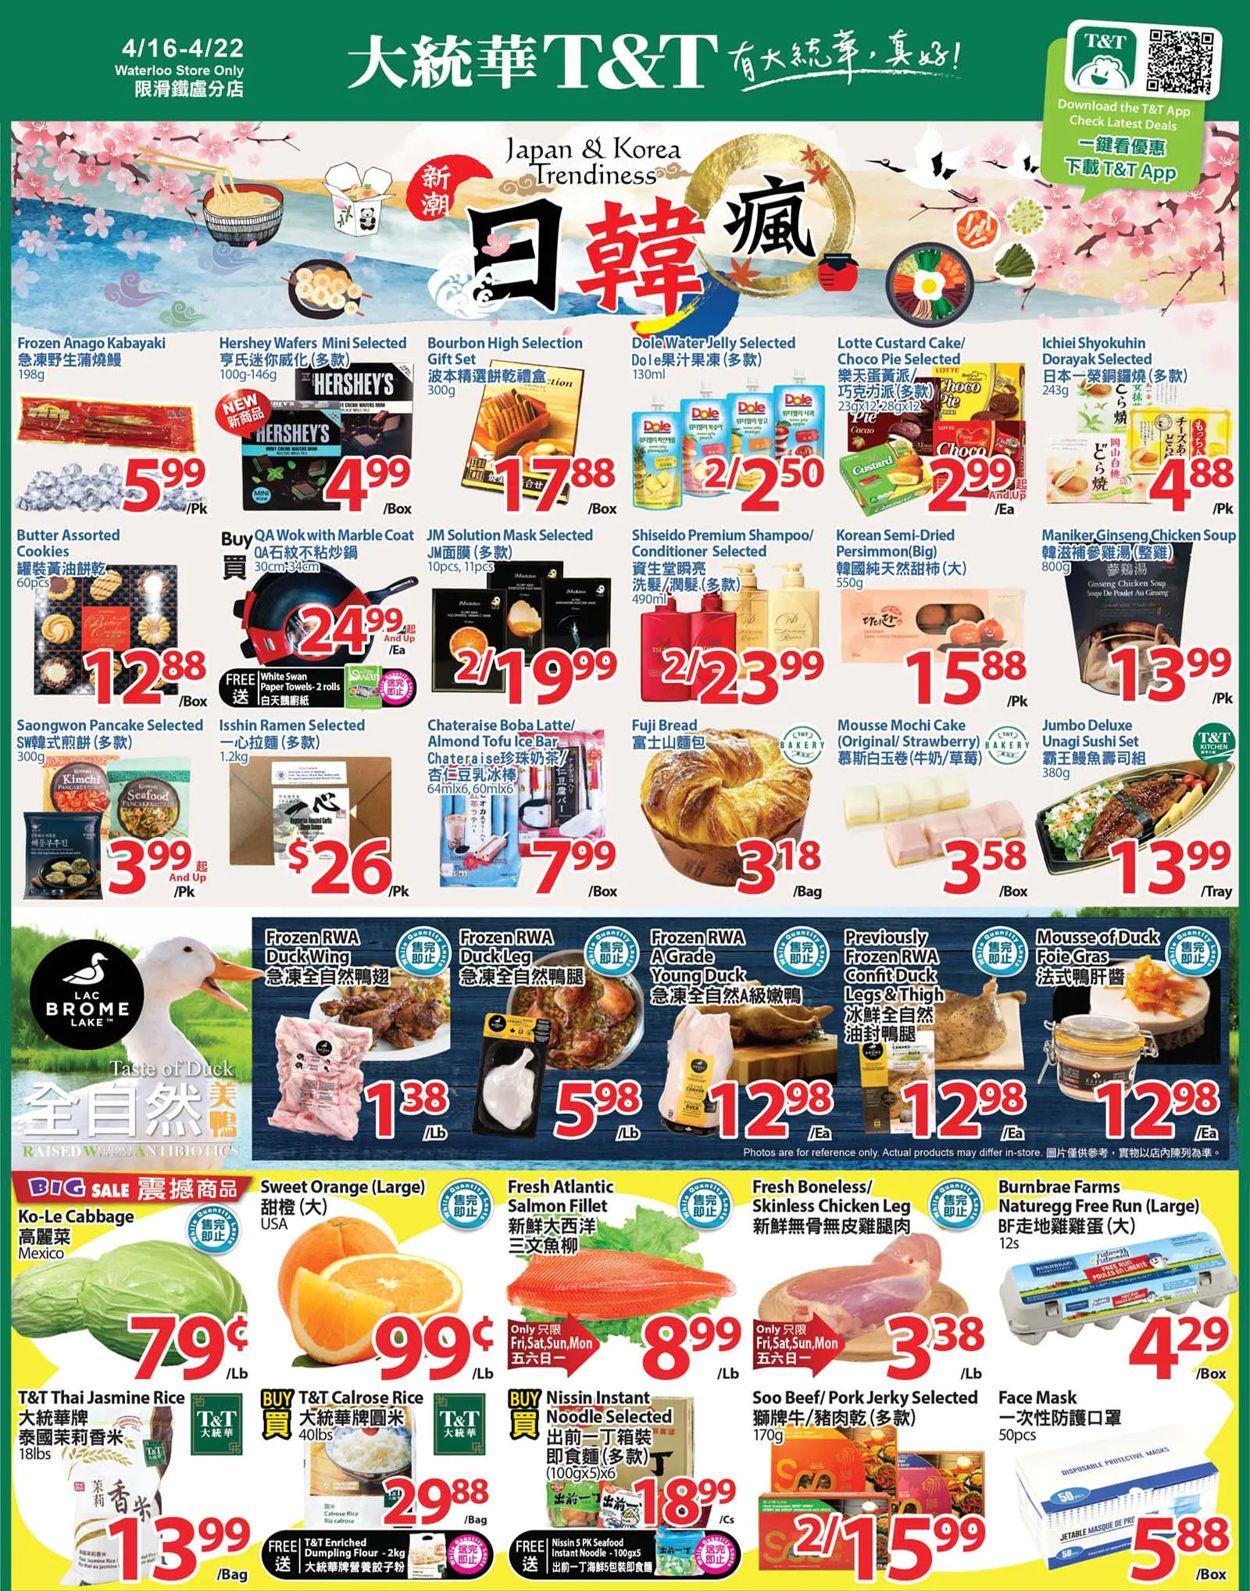 T&T Supermarket - Waterloo Flyer - 04/16-04/22/2021